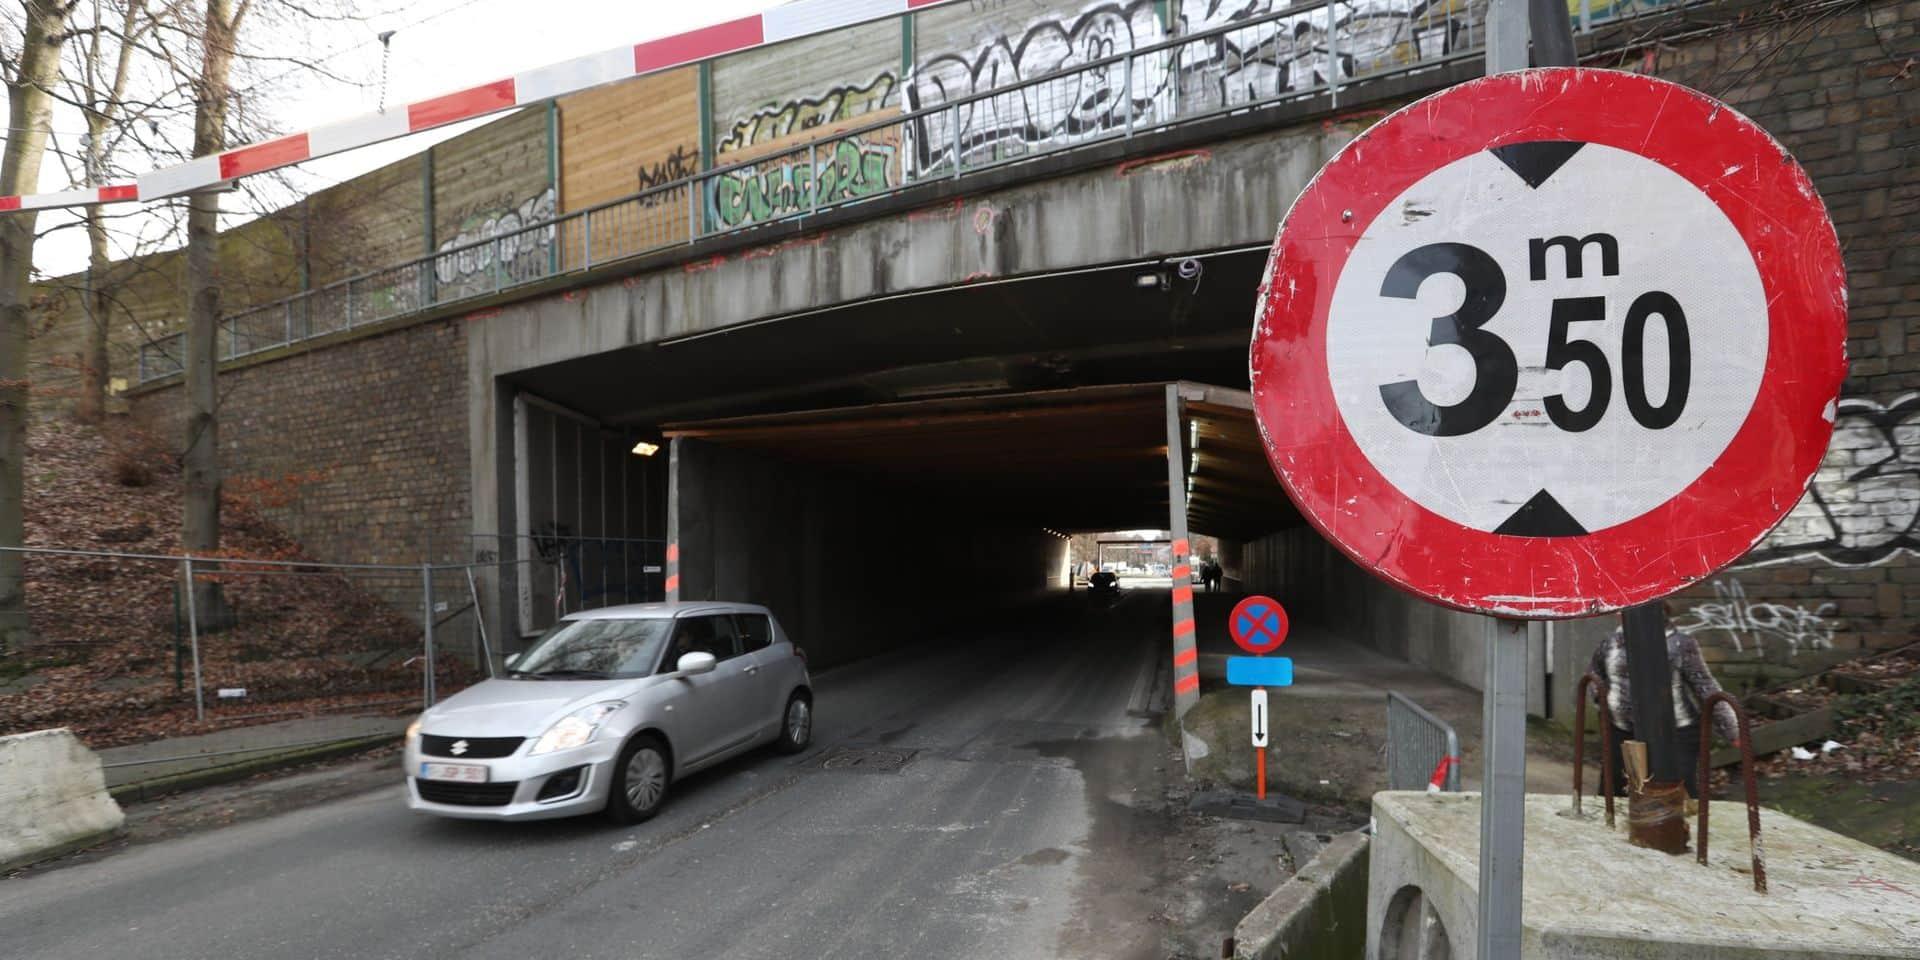 Woluwe-Saint-Lambert : Le tunnel Grosjean en chantier à partir du 18 septembre